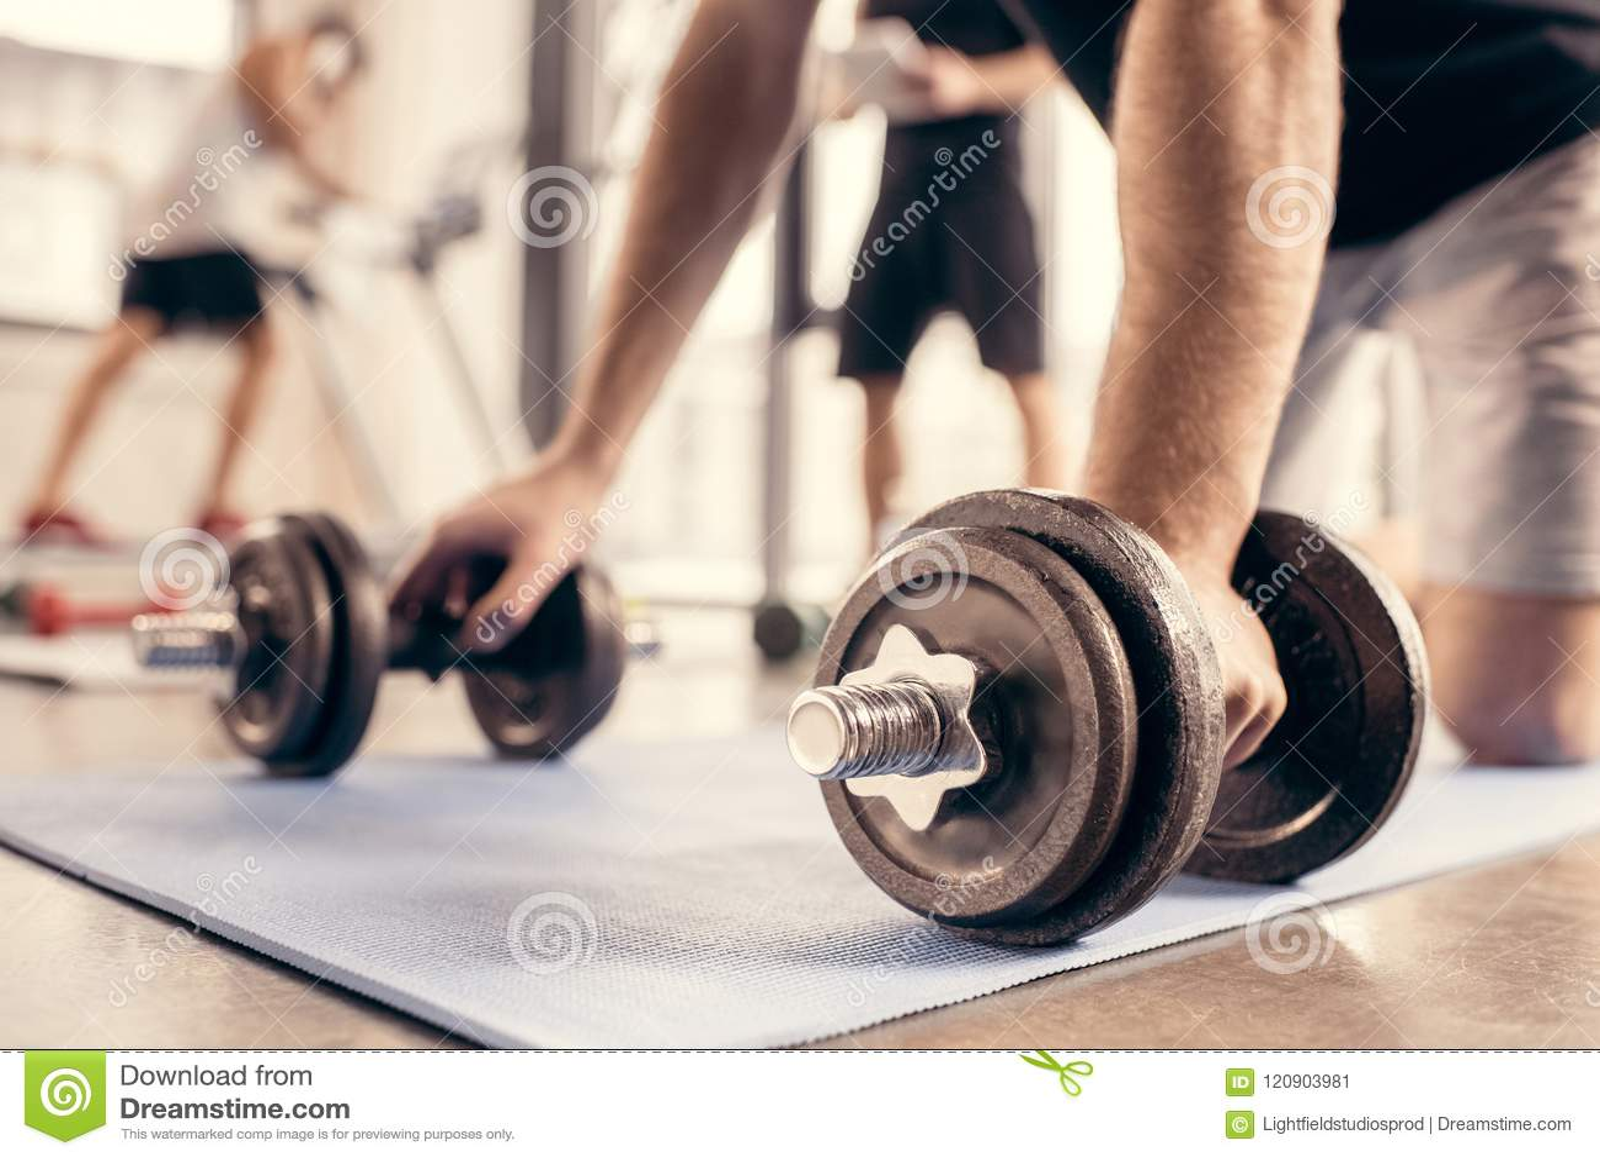 cropped image of sportsman preparing doing push ups on dumbbells